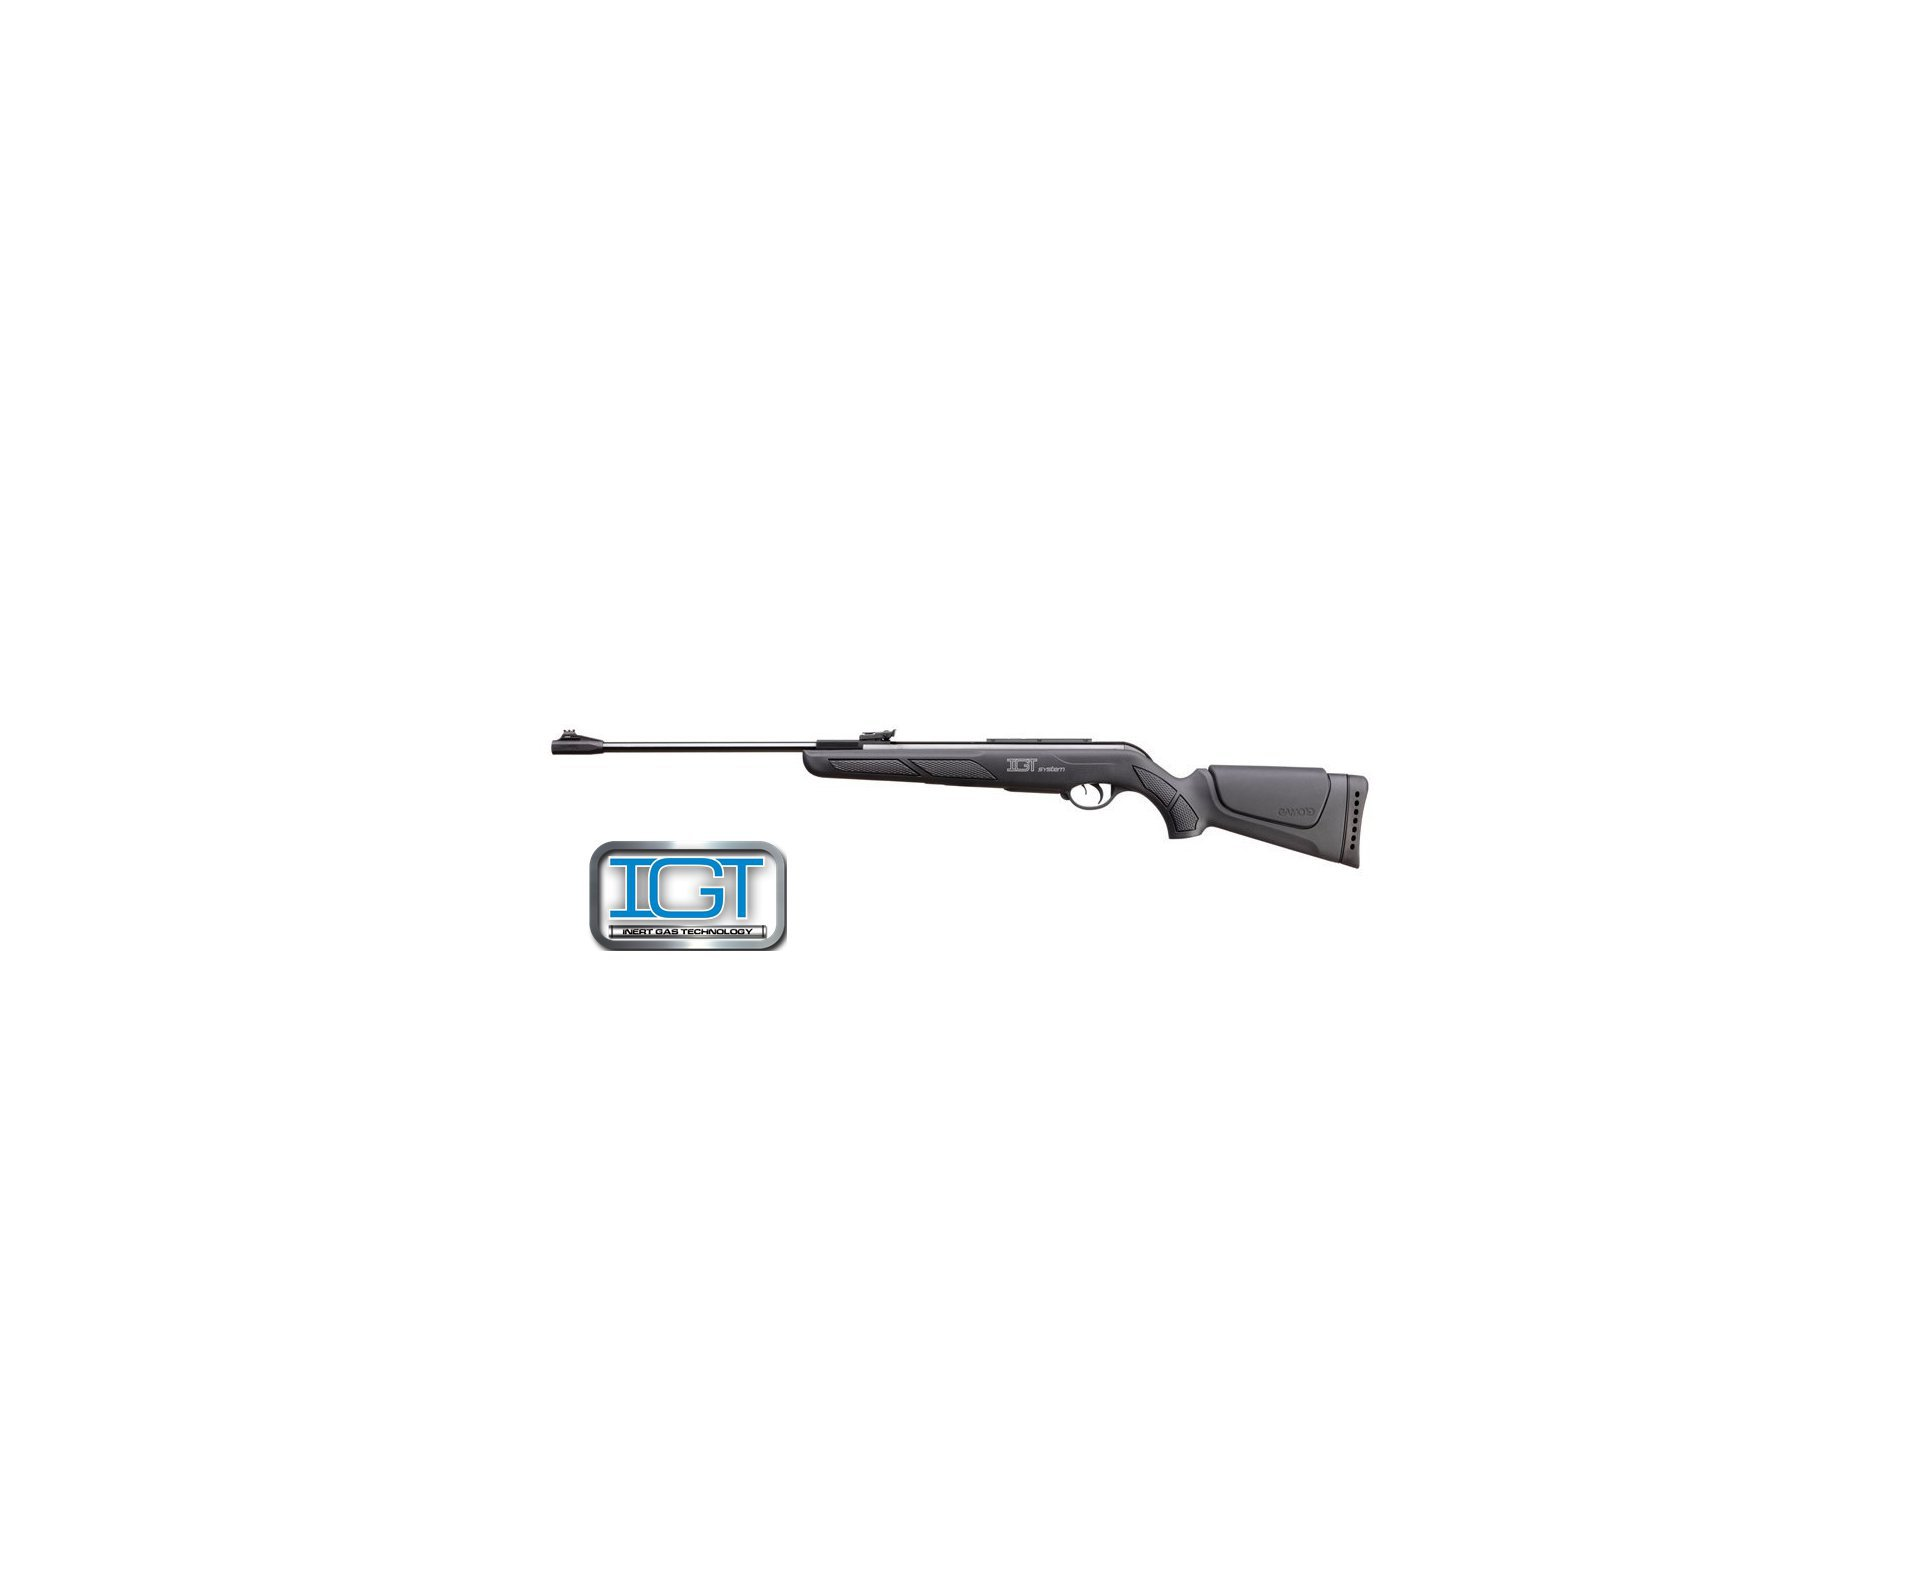 Carabina De Pressão Gamo Shadow Igt - Calibre 5,5 Mm